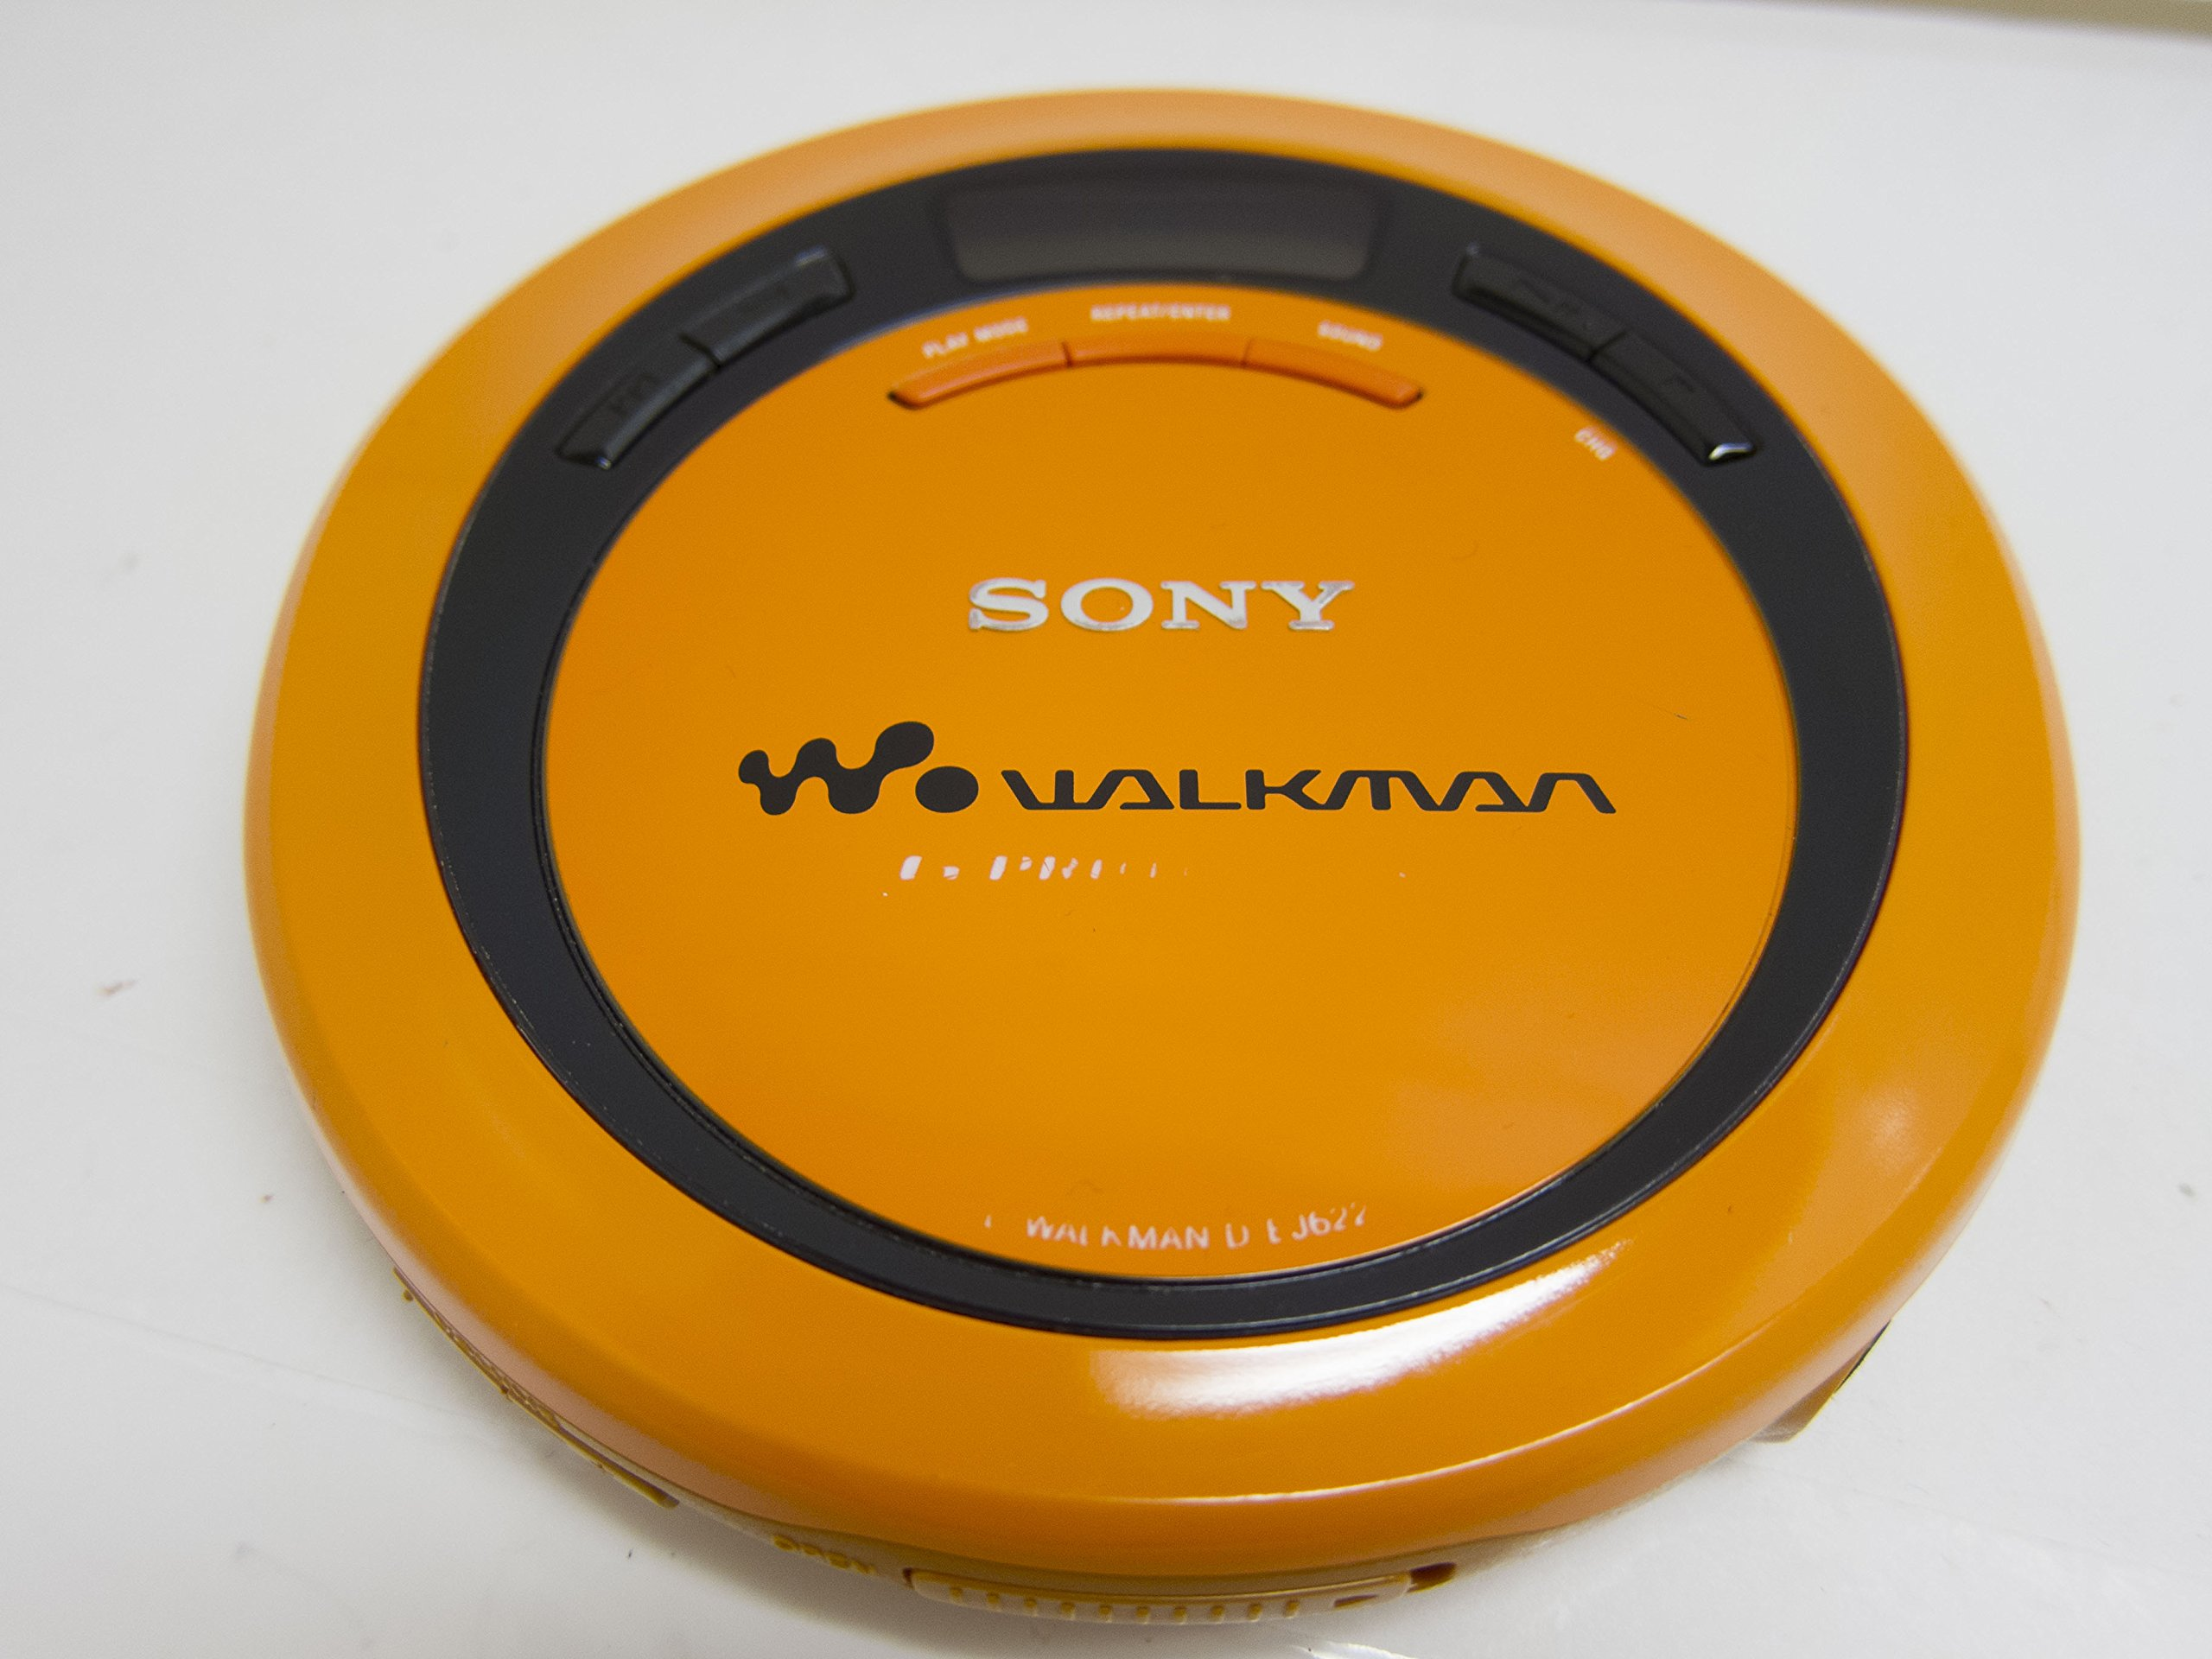 Sony Corp. Portable CD Player CD Walkman D-EJ622 Model# Sony CD Walkman D-EJ622 (Orange Color Version)